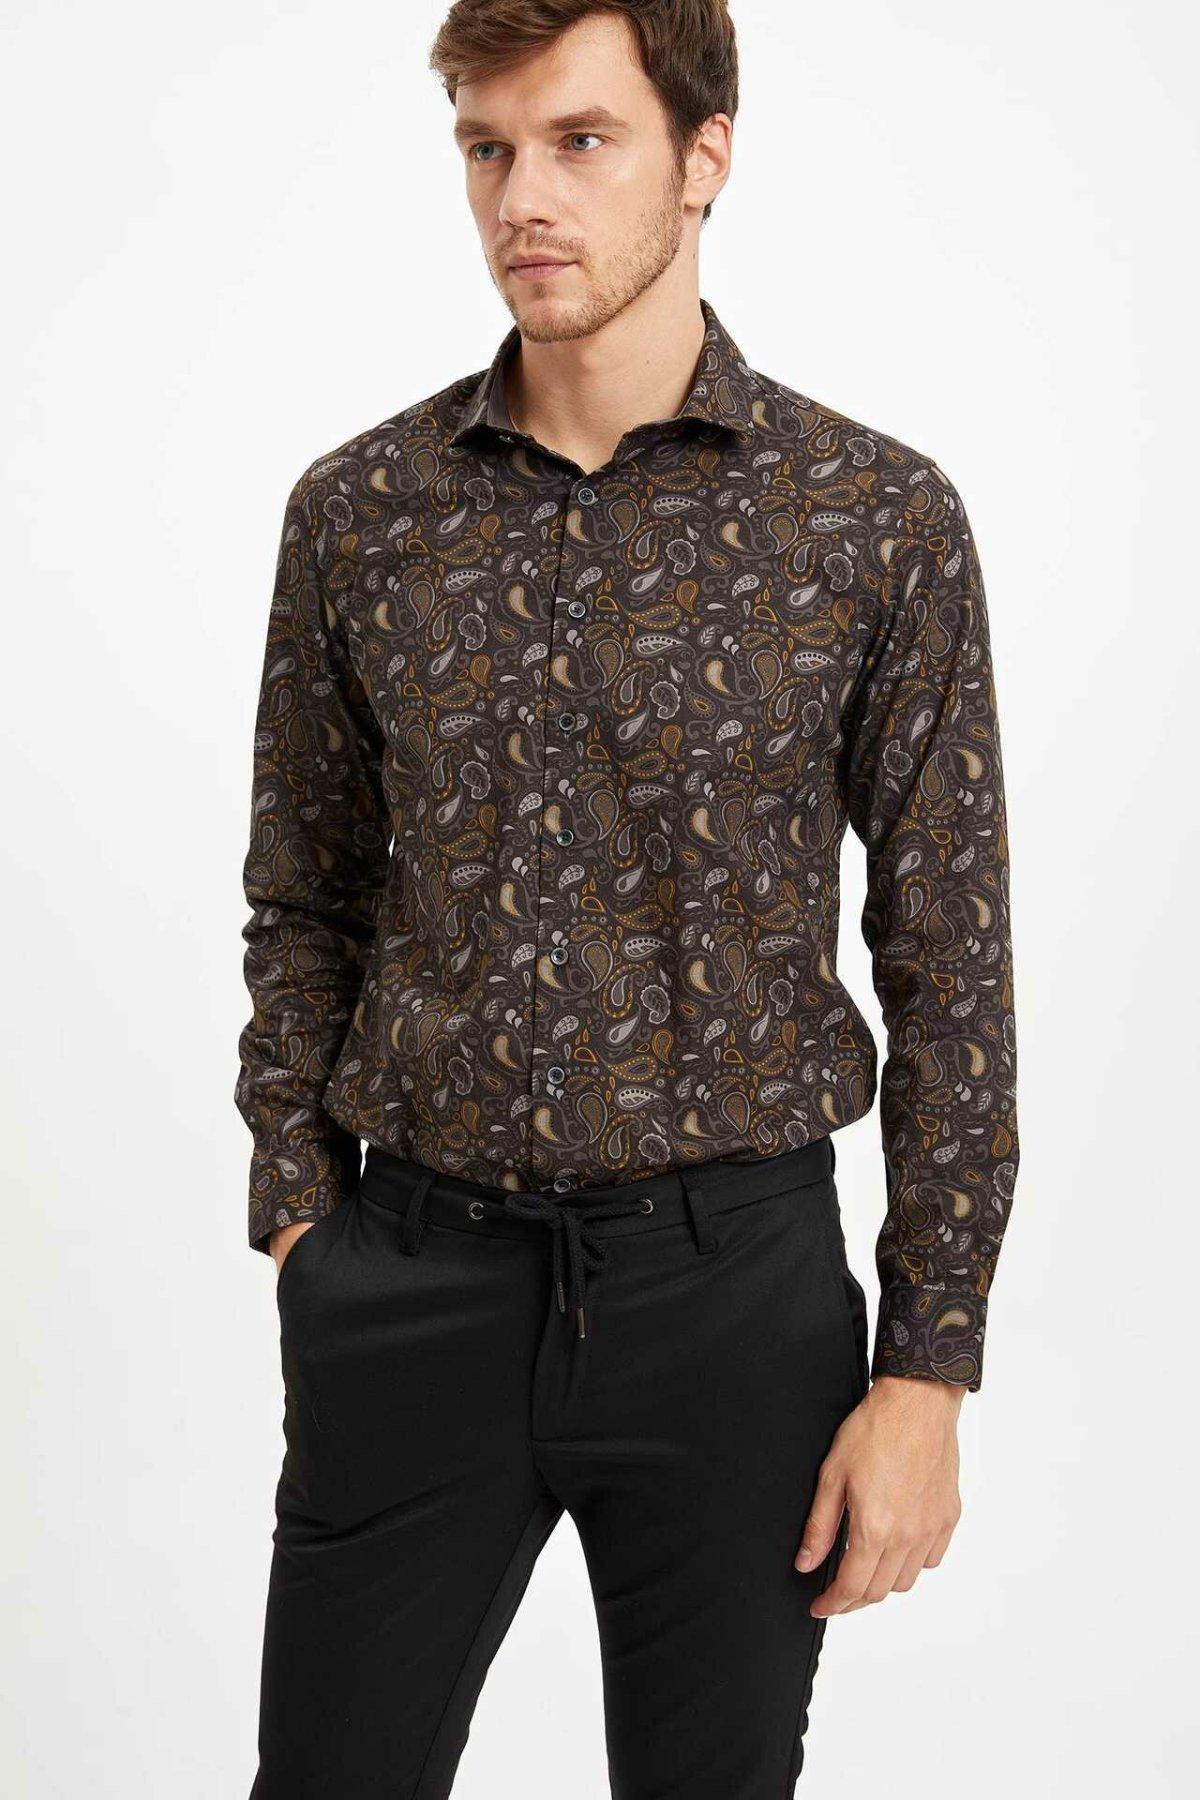 DeFacto Man Winter Vintage Prints Top Shirts Men Casual Long Sleeve Shirt Male Smart Casual Top Shirts-M2851AZ19WN